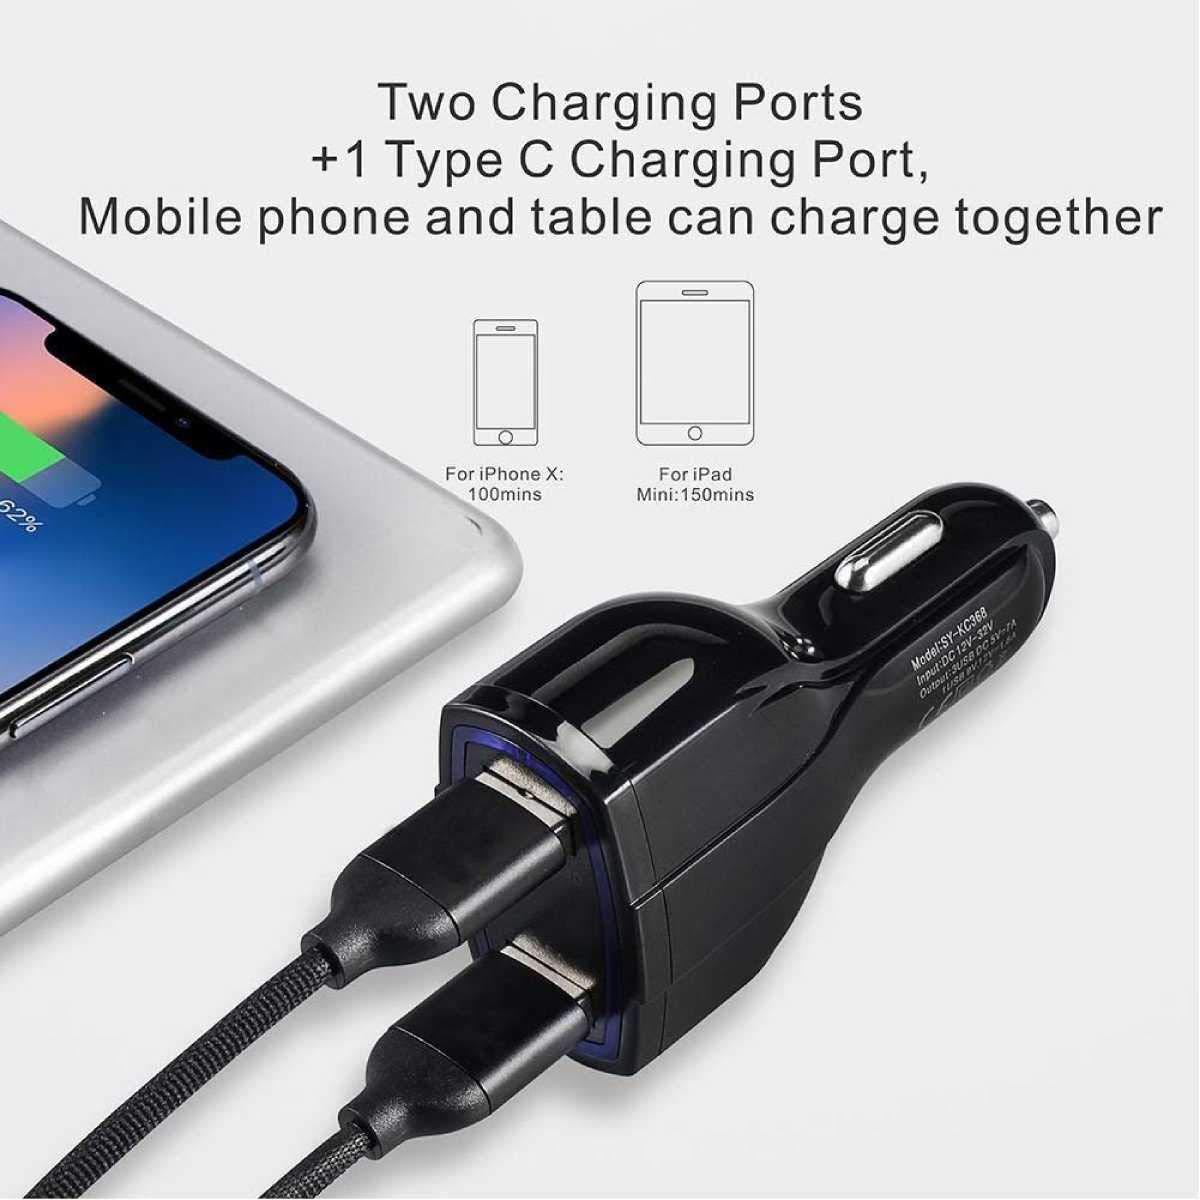 ULTRICS Chargeur de Voiture USB Noir iPhone XS Max//X//8 Plus etc Type C Quick Charge 3.0 iSmart 3 Ports Universel Rapide Adaptateur Allume Cigare Chargeur pour Android Smartphones Samsung S9//S8